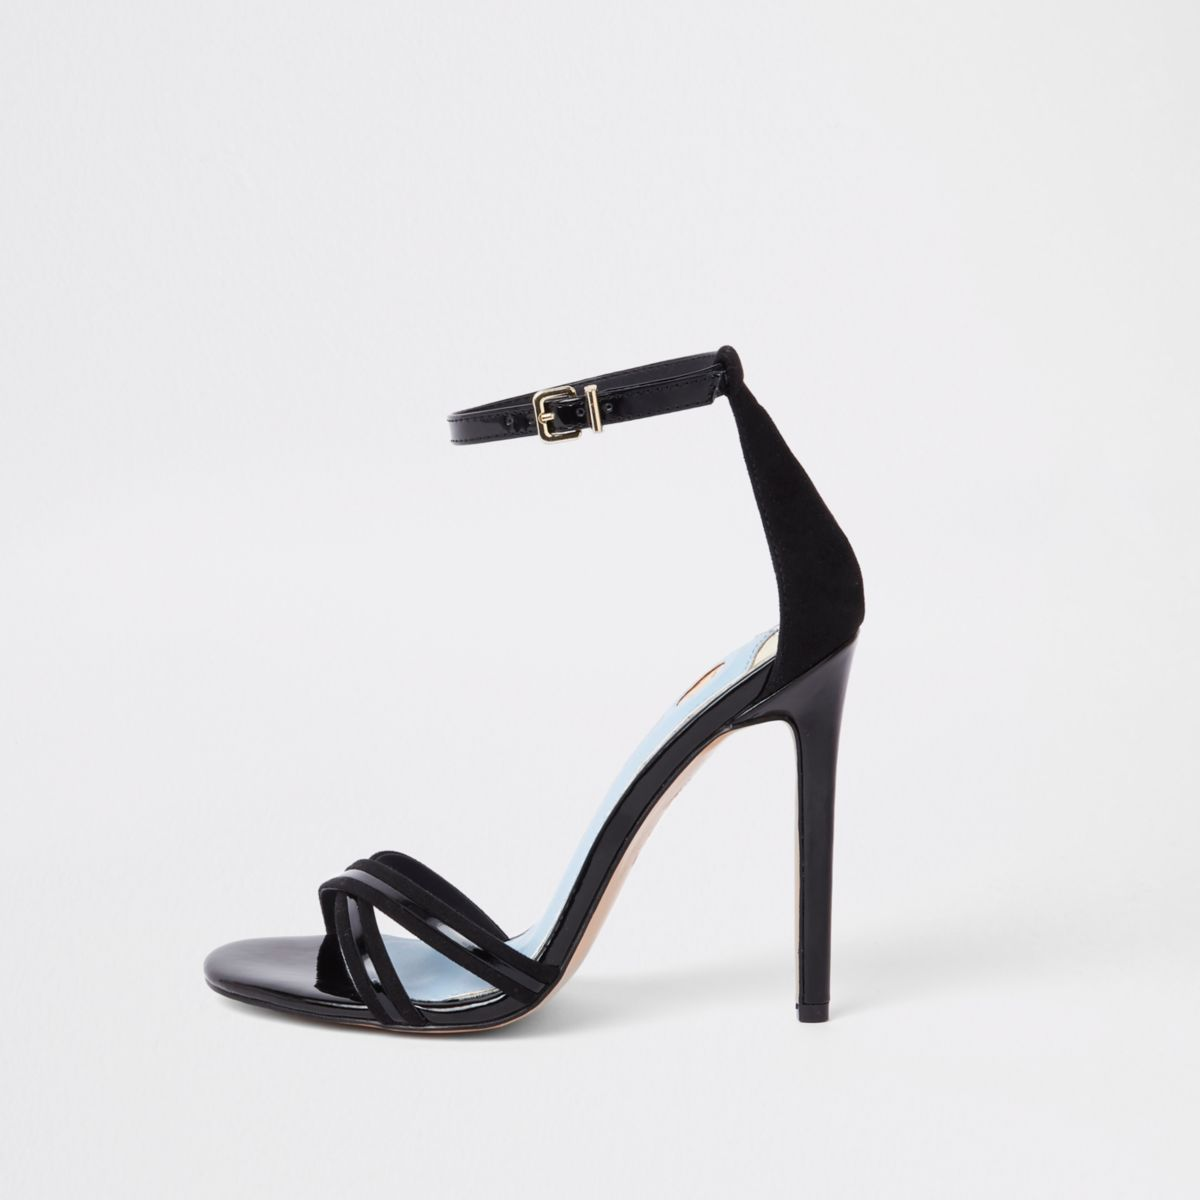 Schwarze, filigrane Sandalen mit überkreuzten Riemen